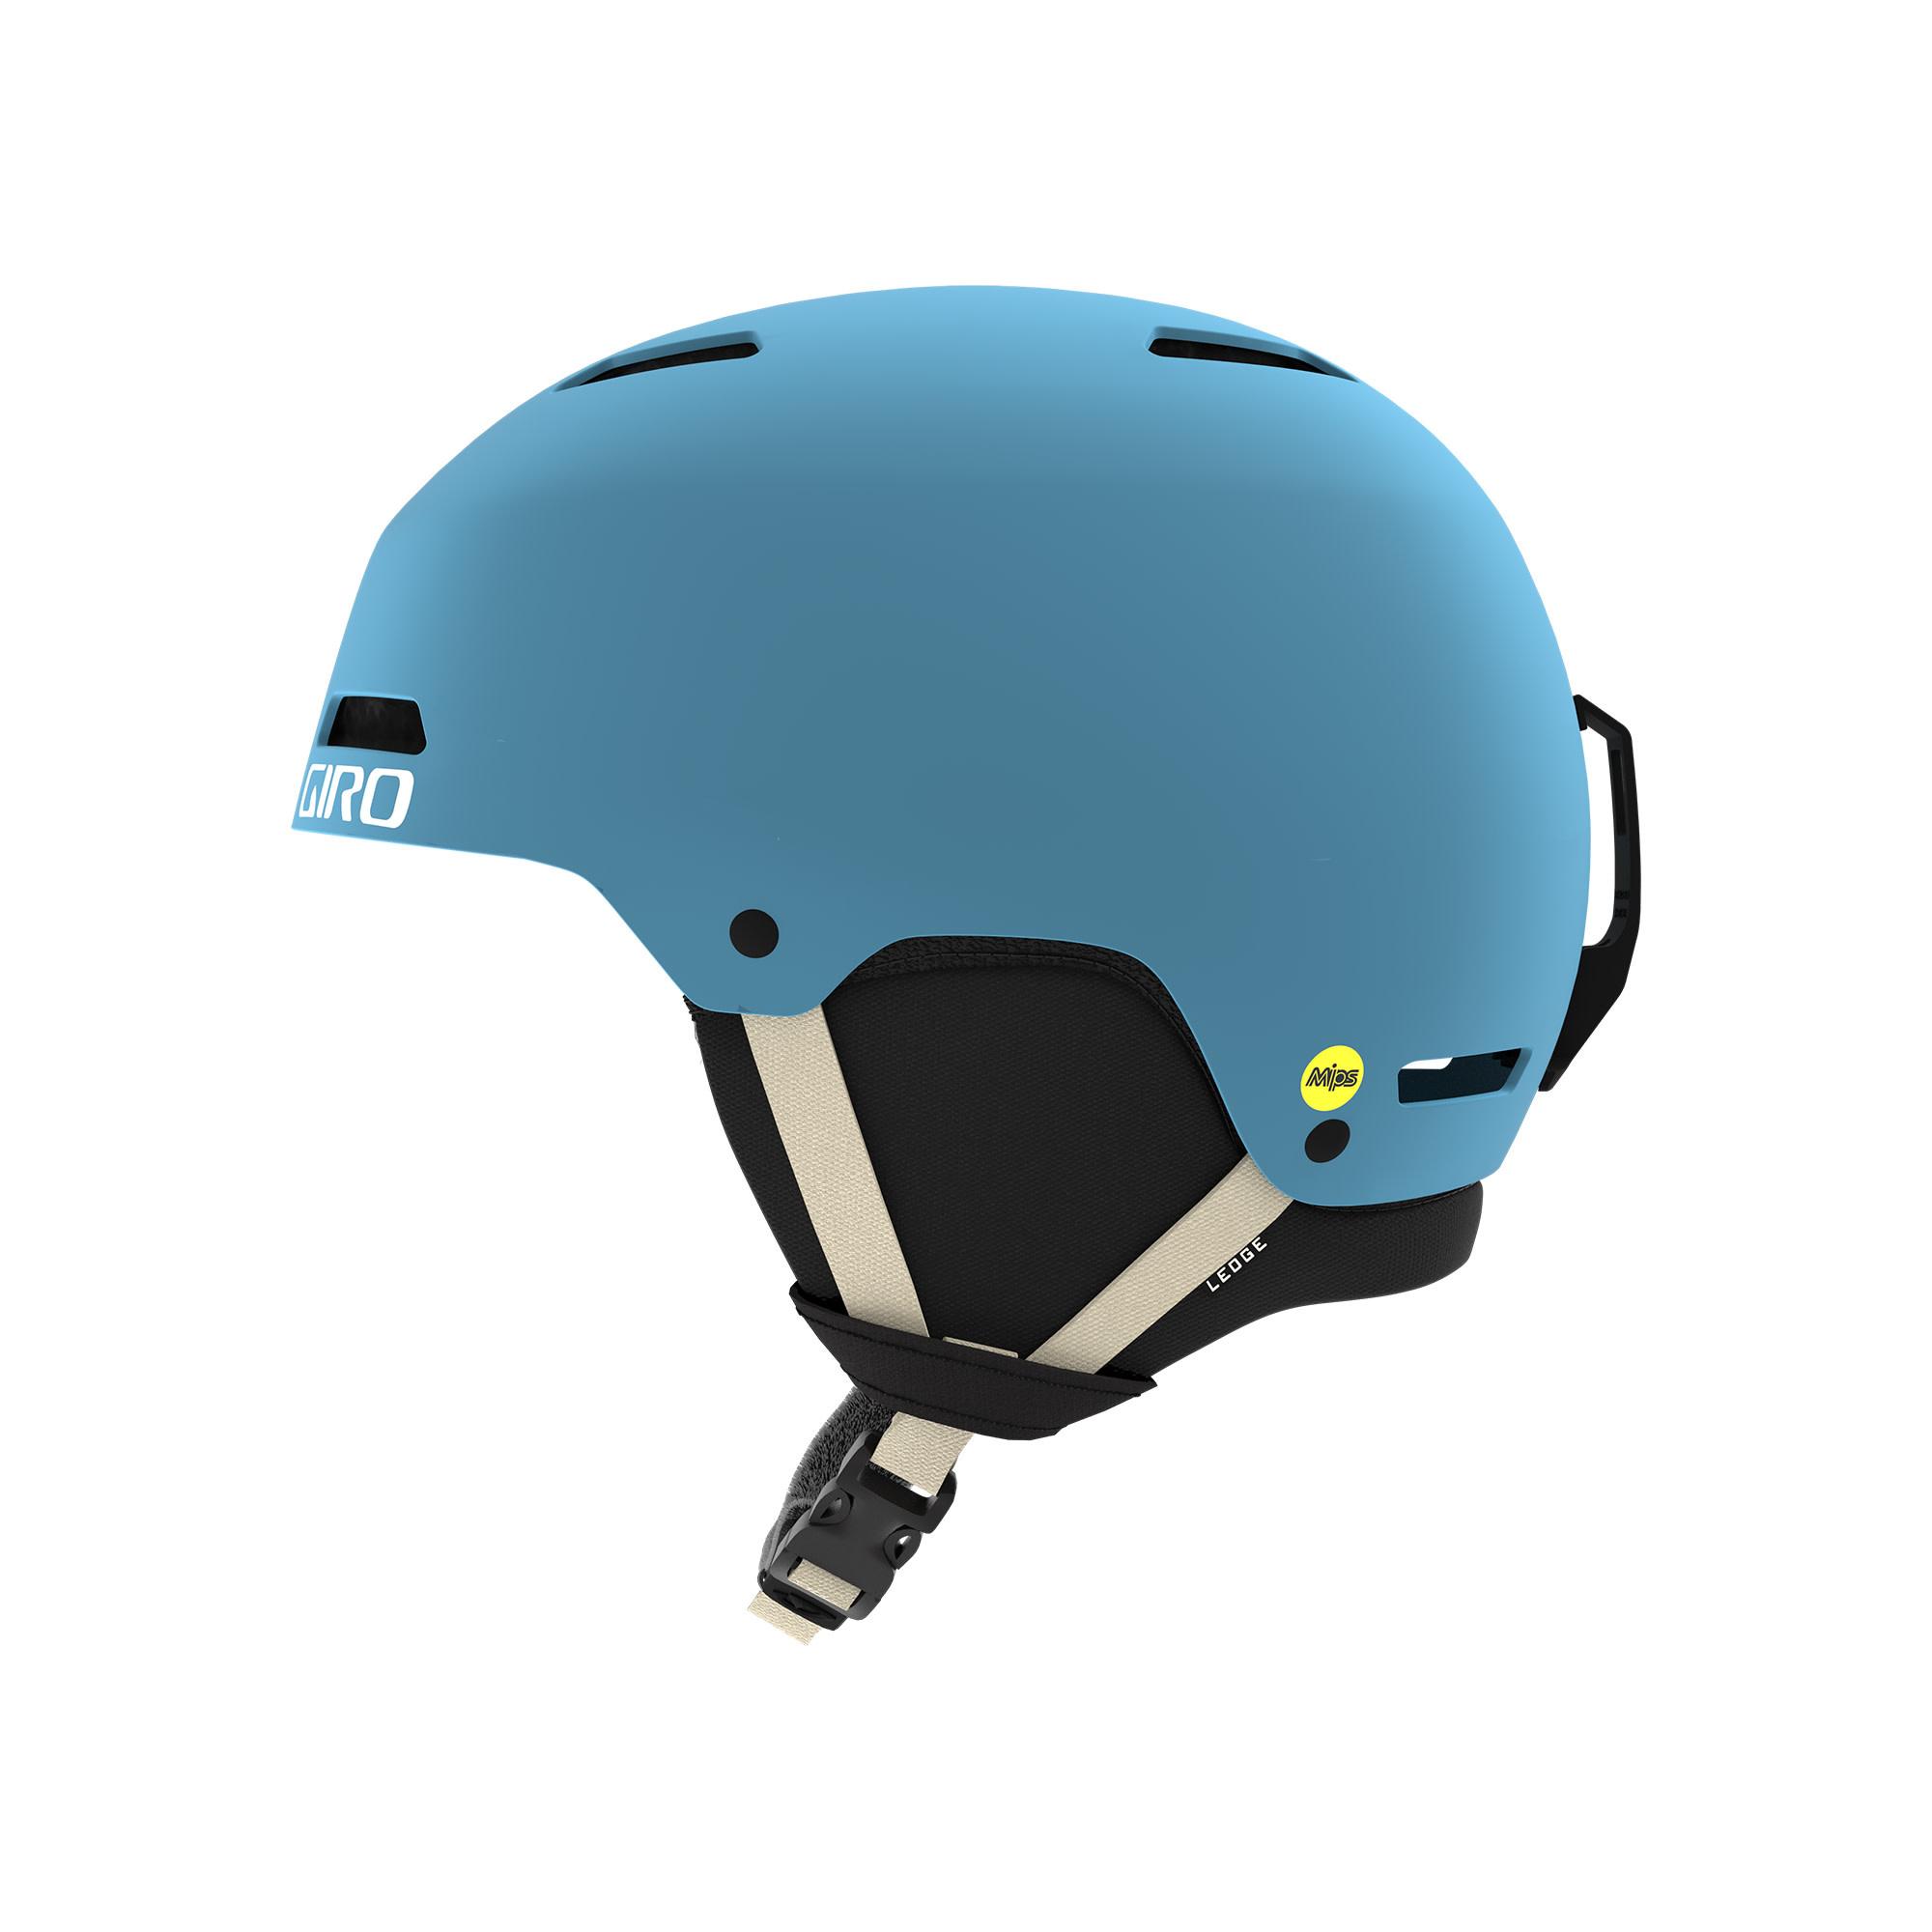 Giro Ledge FS MIPS-9